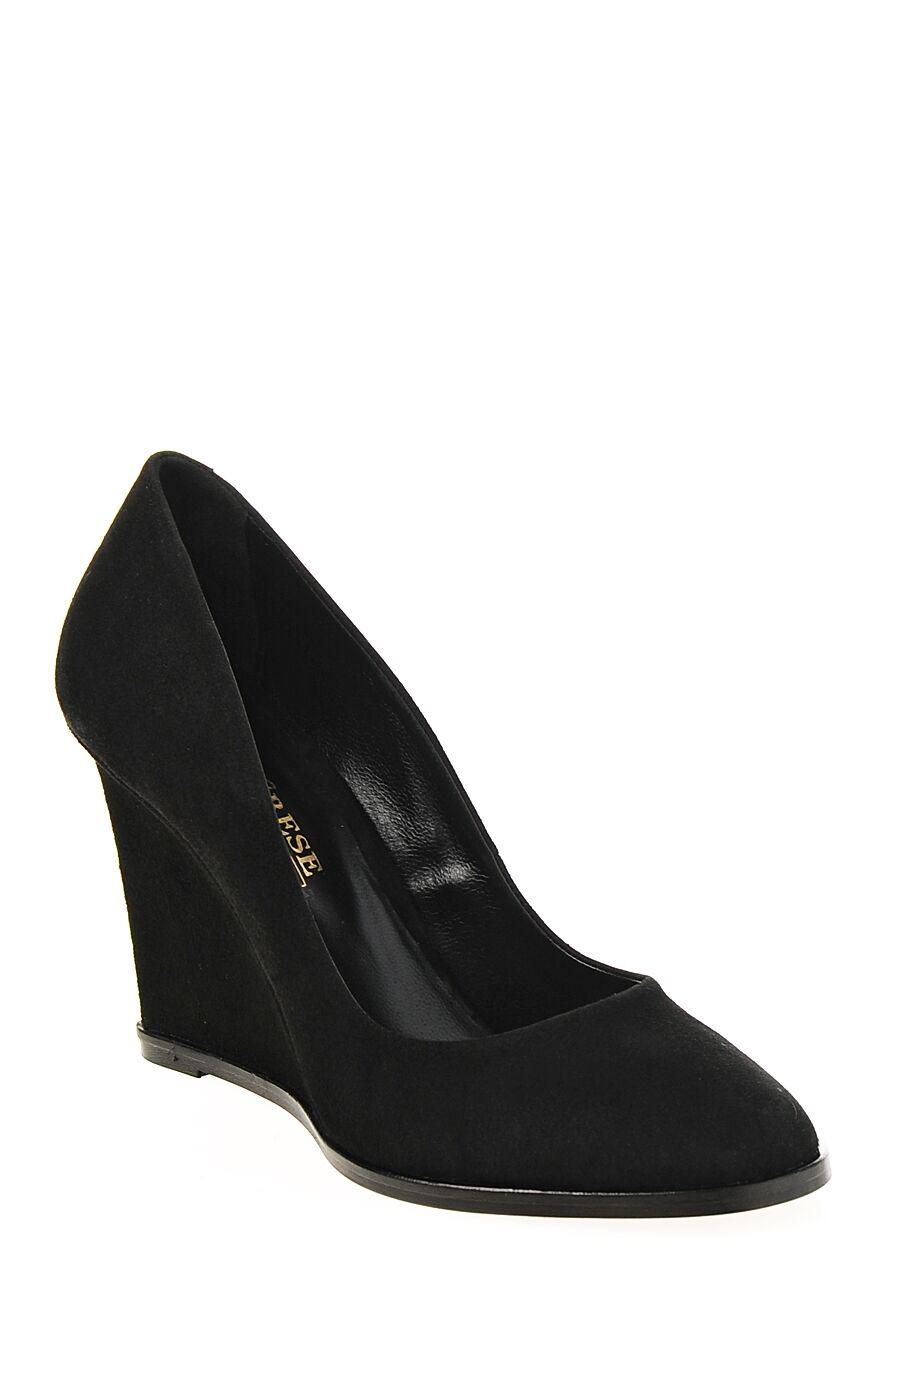 Siyah Süet Dolgu Topuklu Ayakkabı